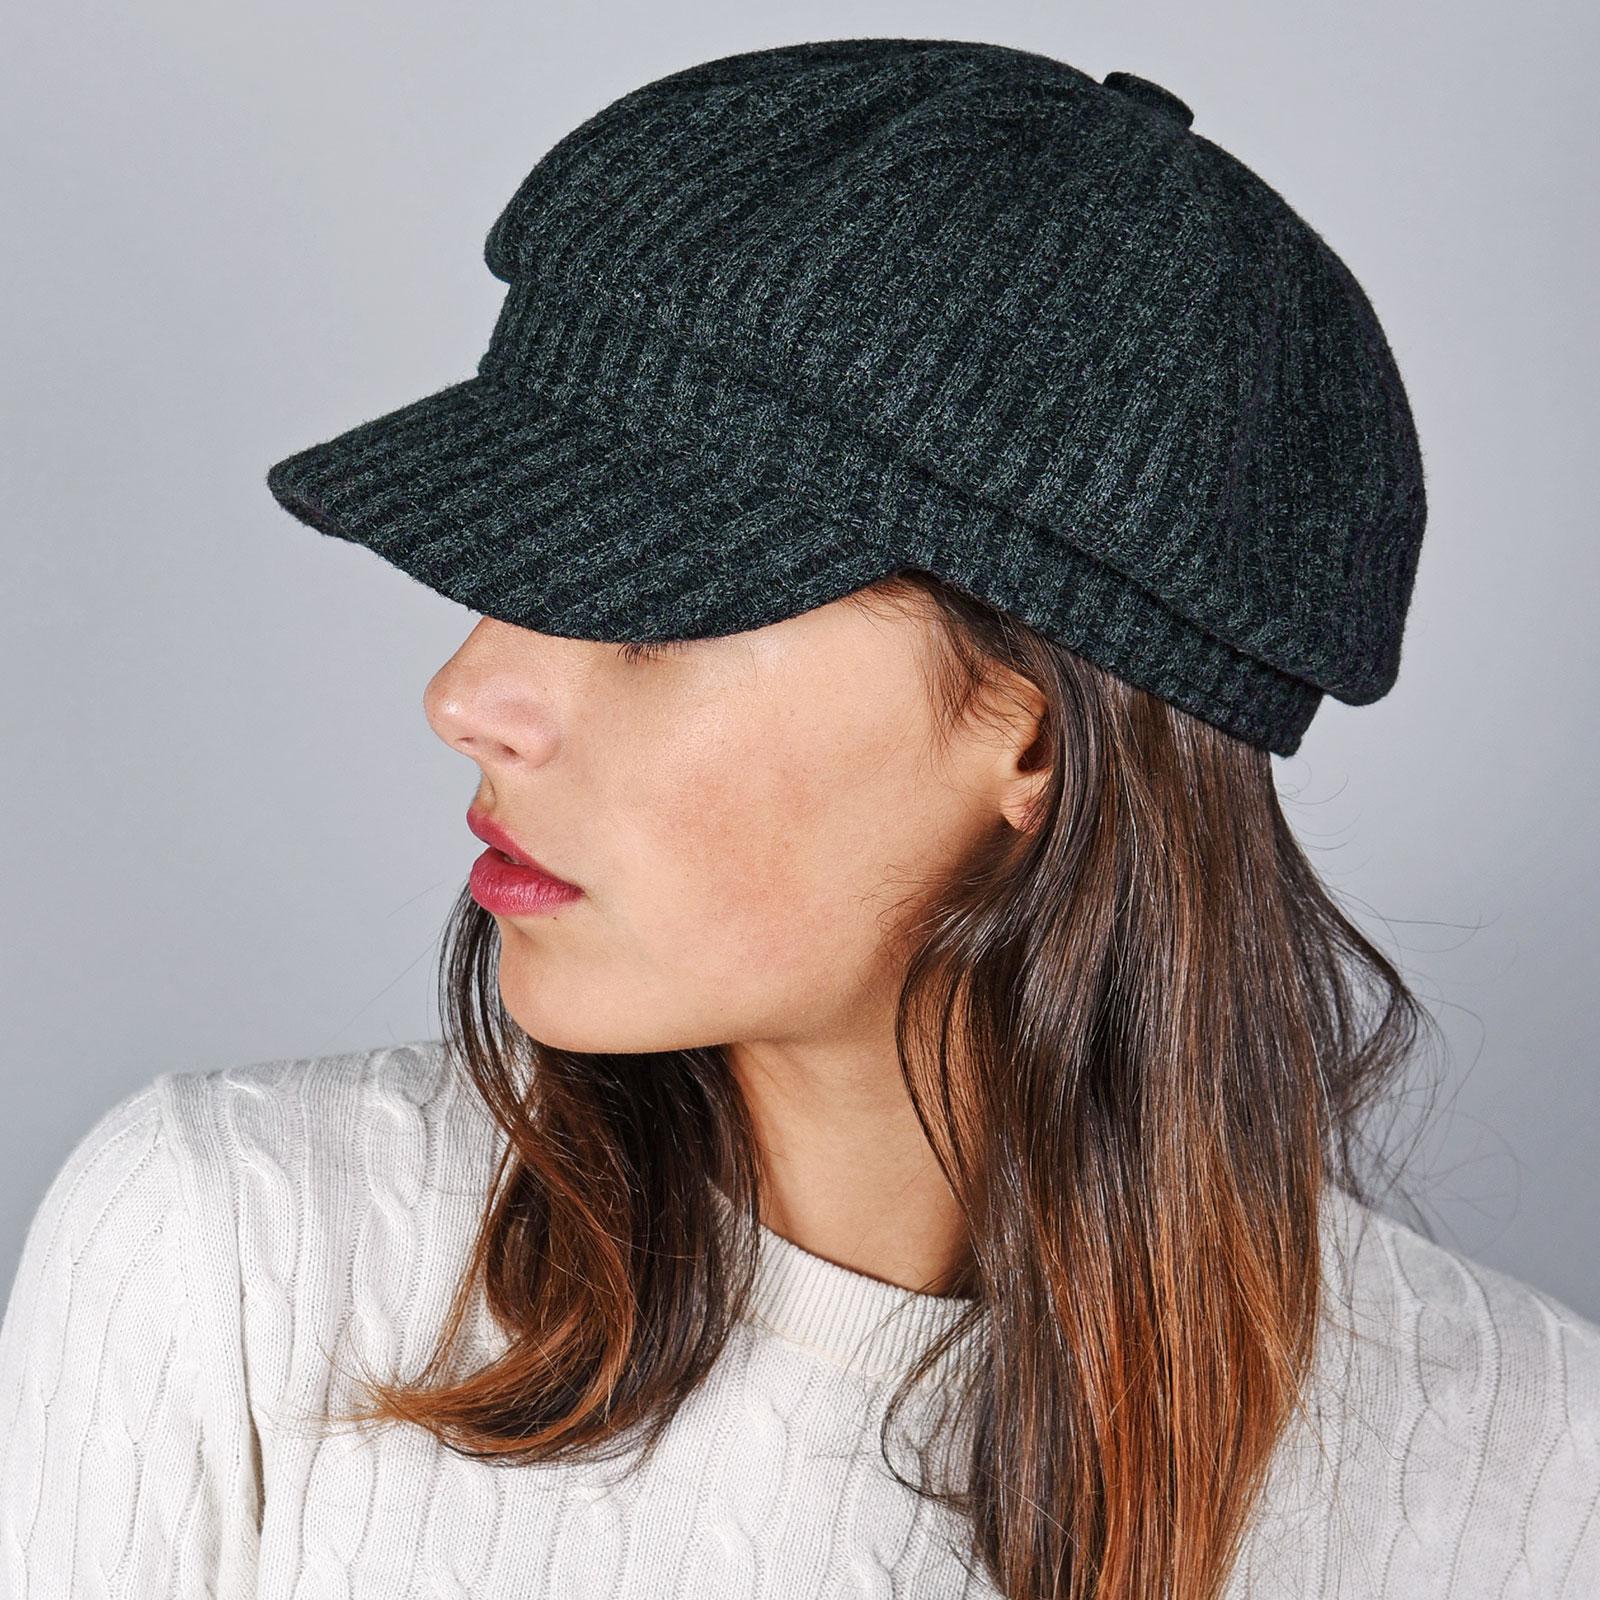 CP-01586-VF10-1-casquette-femme-hiver-ardoise